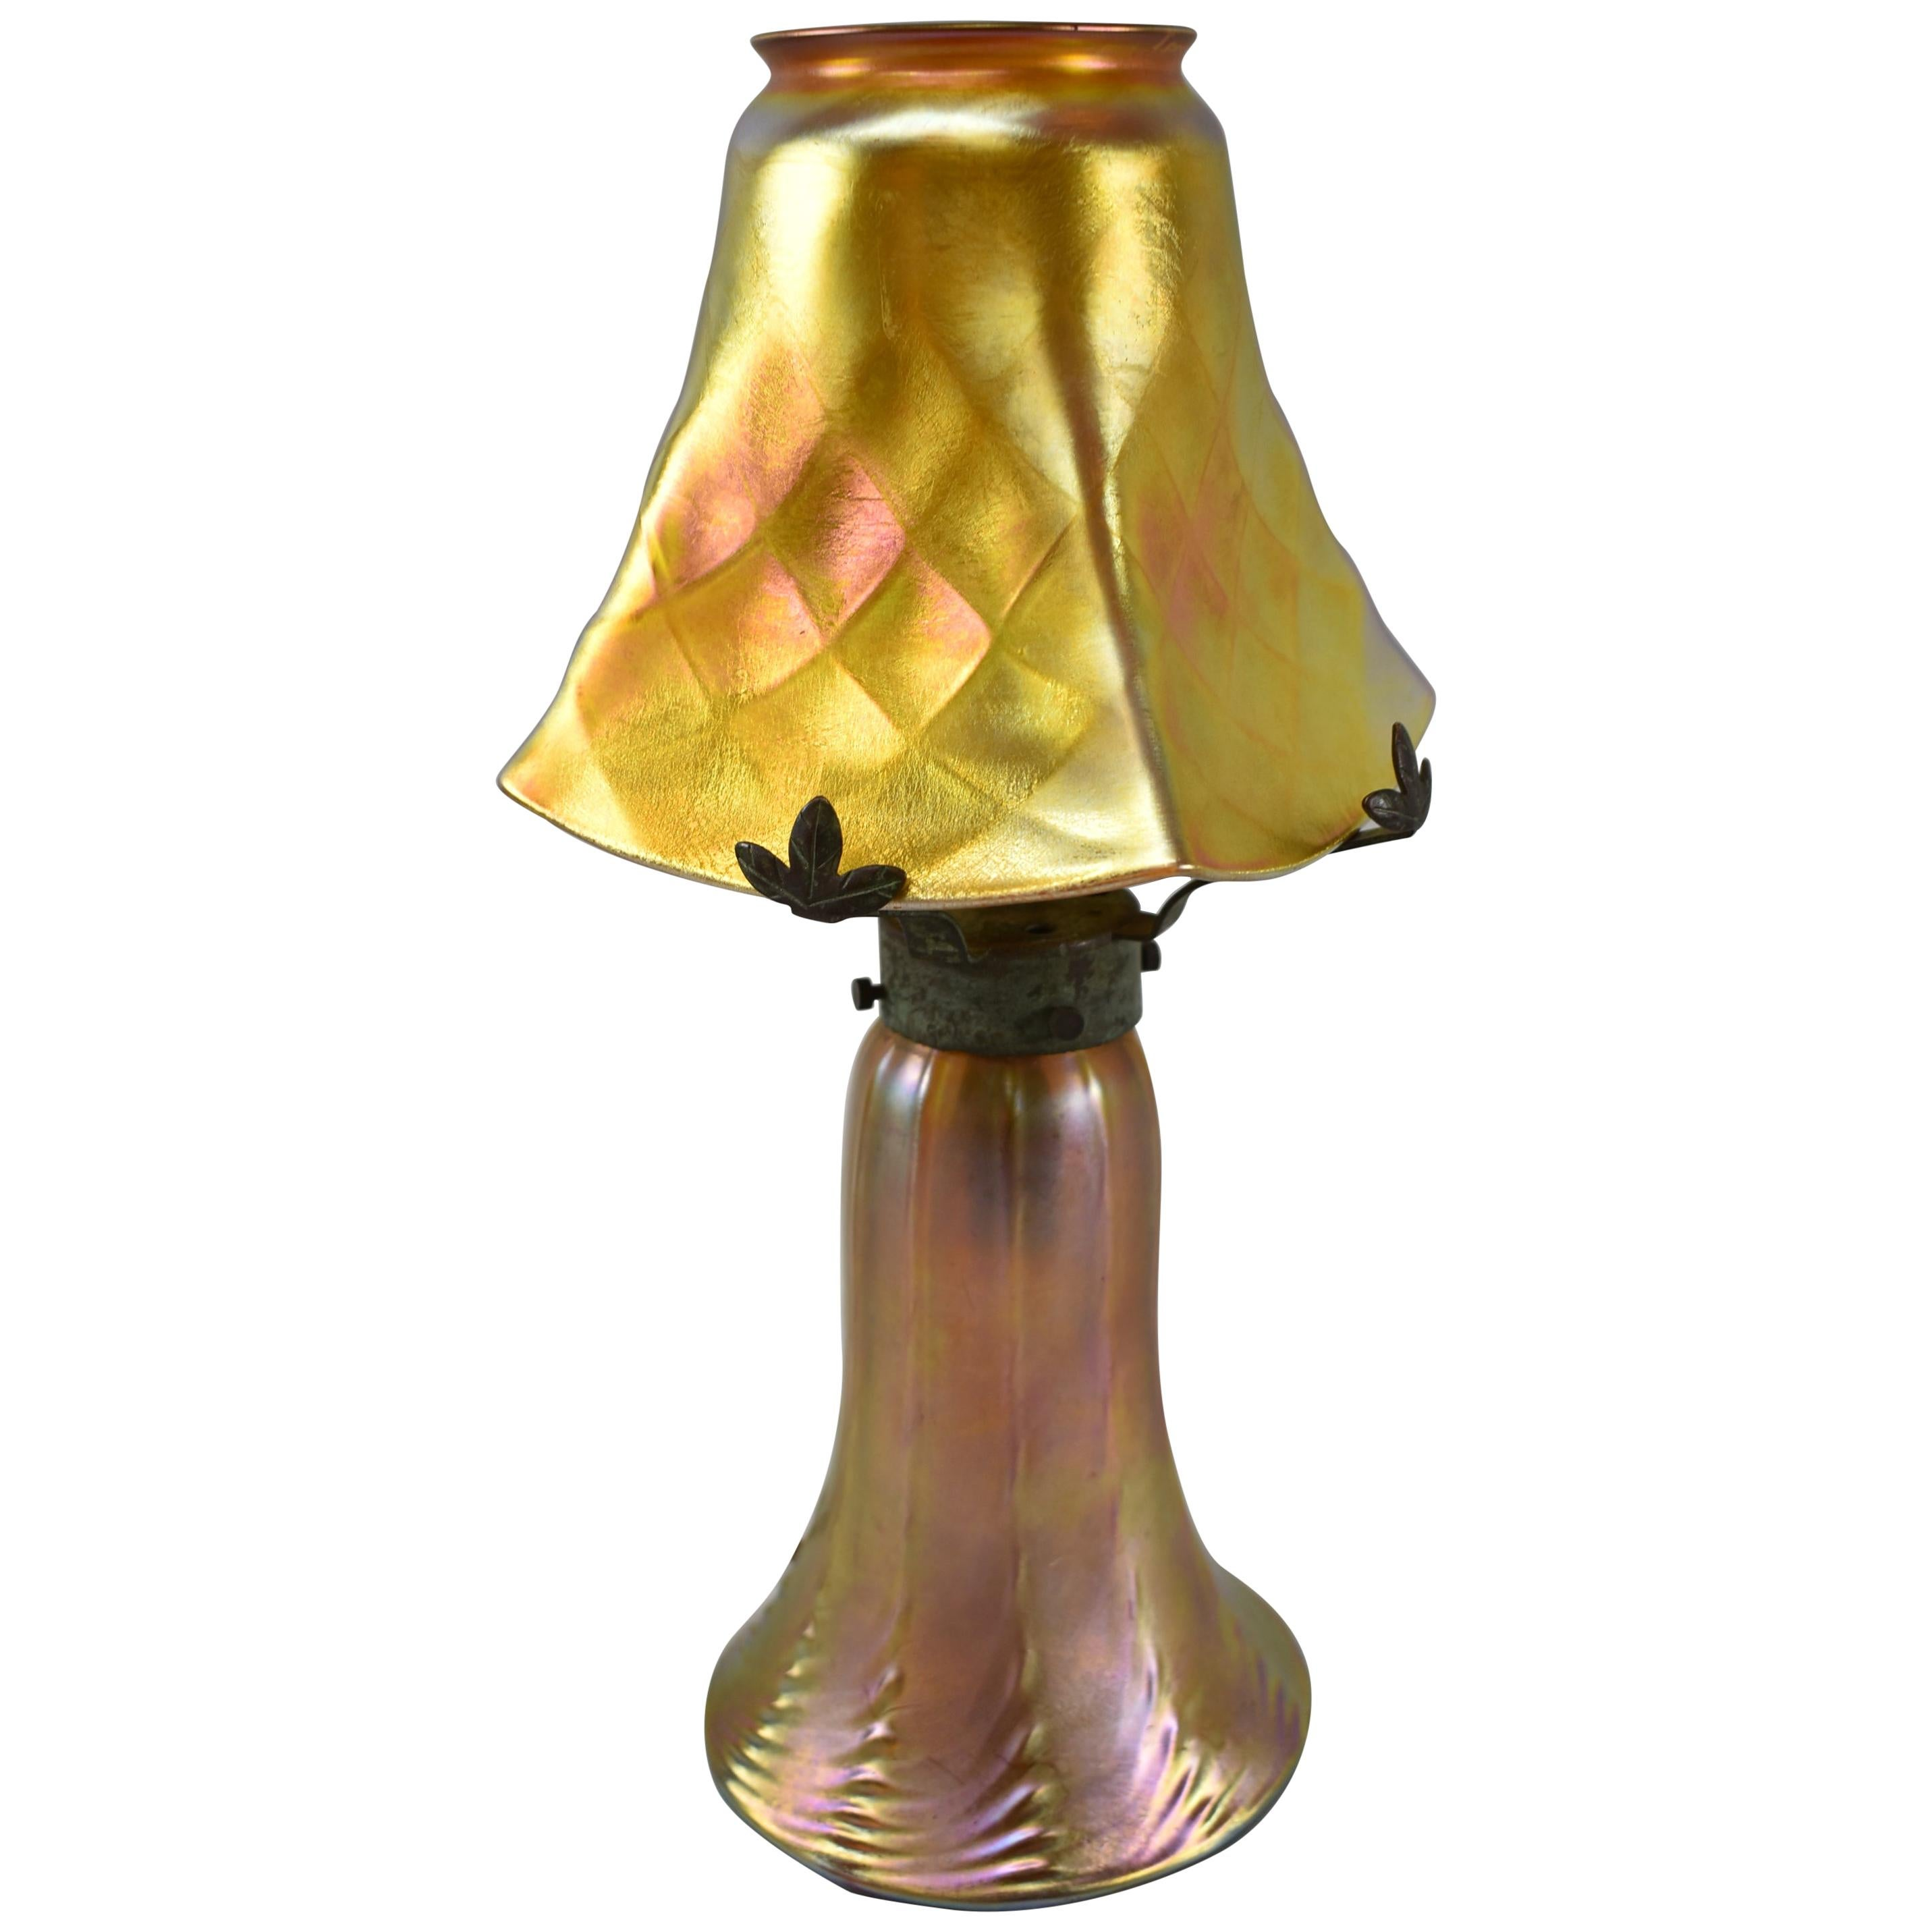 Quezal Art Glass Table Lamp Brass Mounts